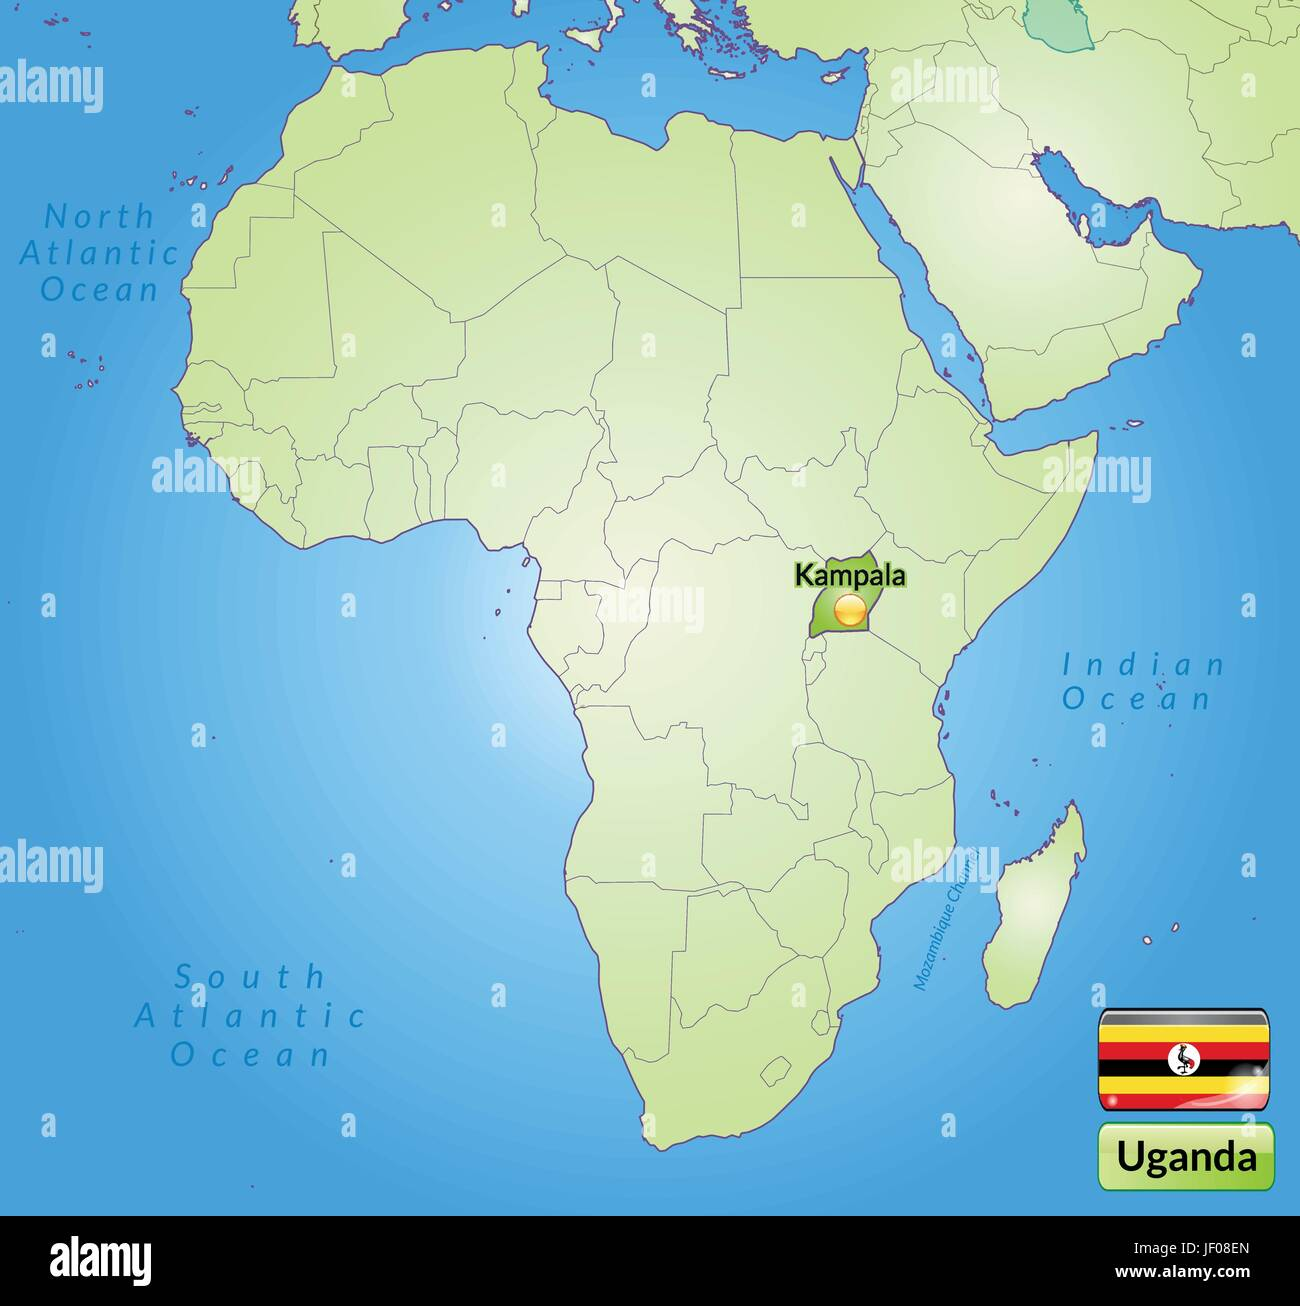 Map Of Uganda Stock Photos & Map Of Uganda Stock Images - Alamy